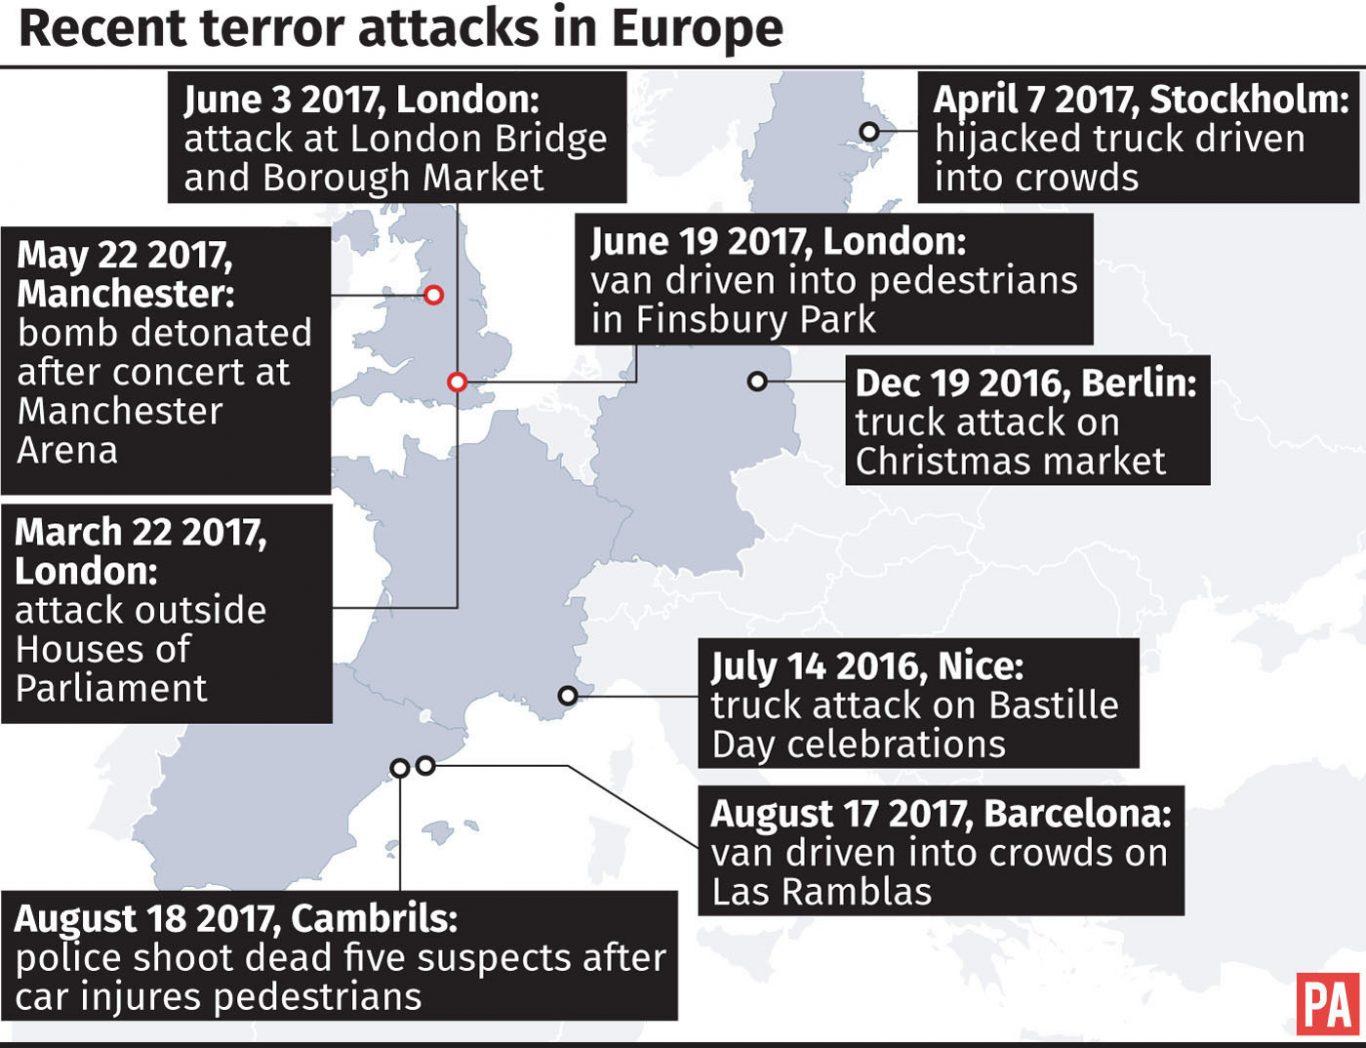 Recent terror attacks in Europe